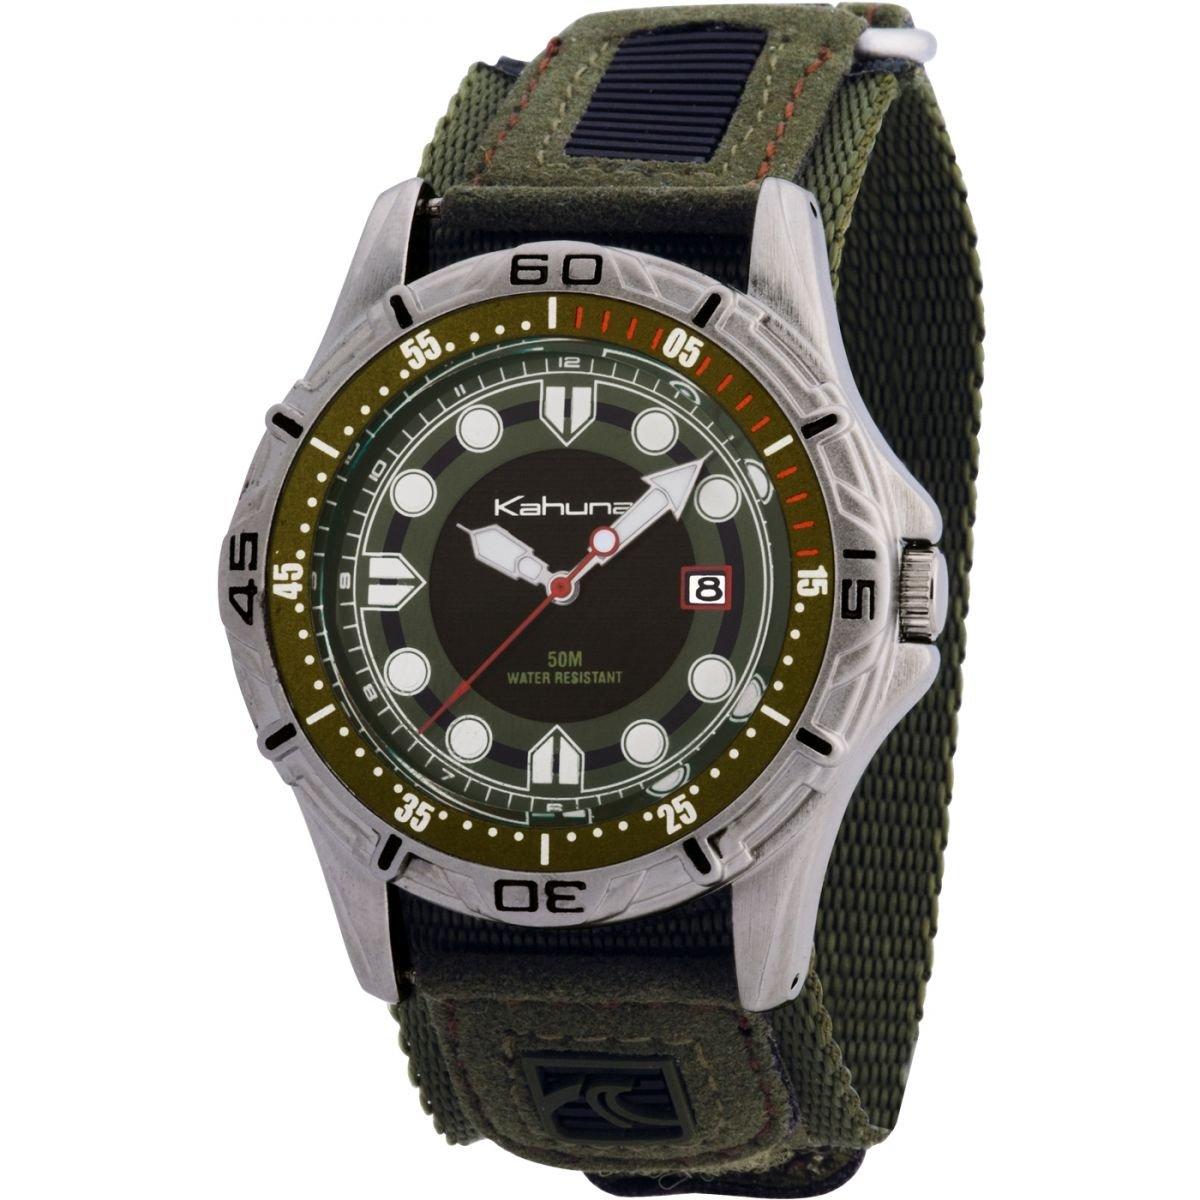 Kahuna K5V-0003G - Reloj analógico de caballero de cuarzo con correa verde